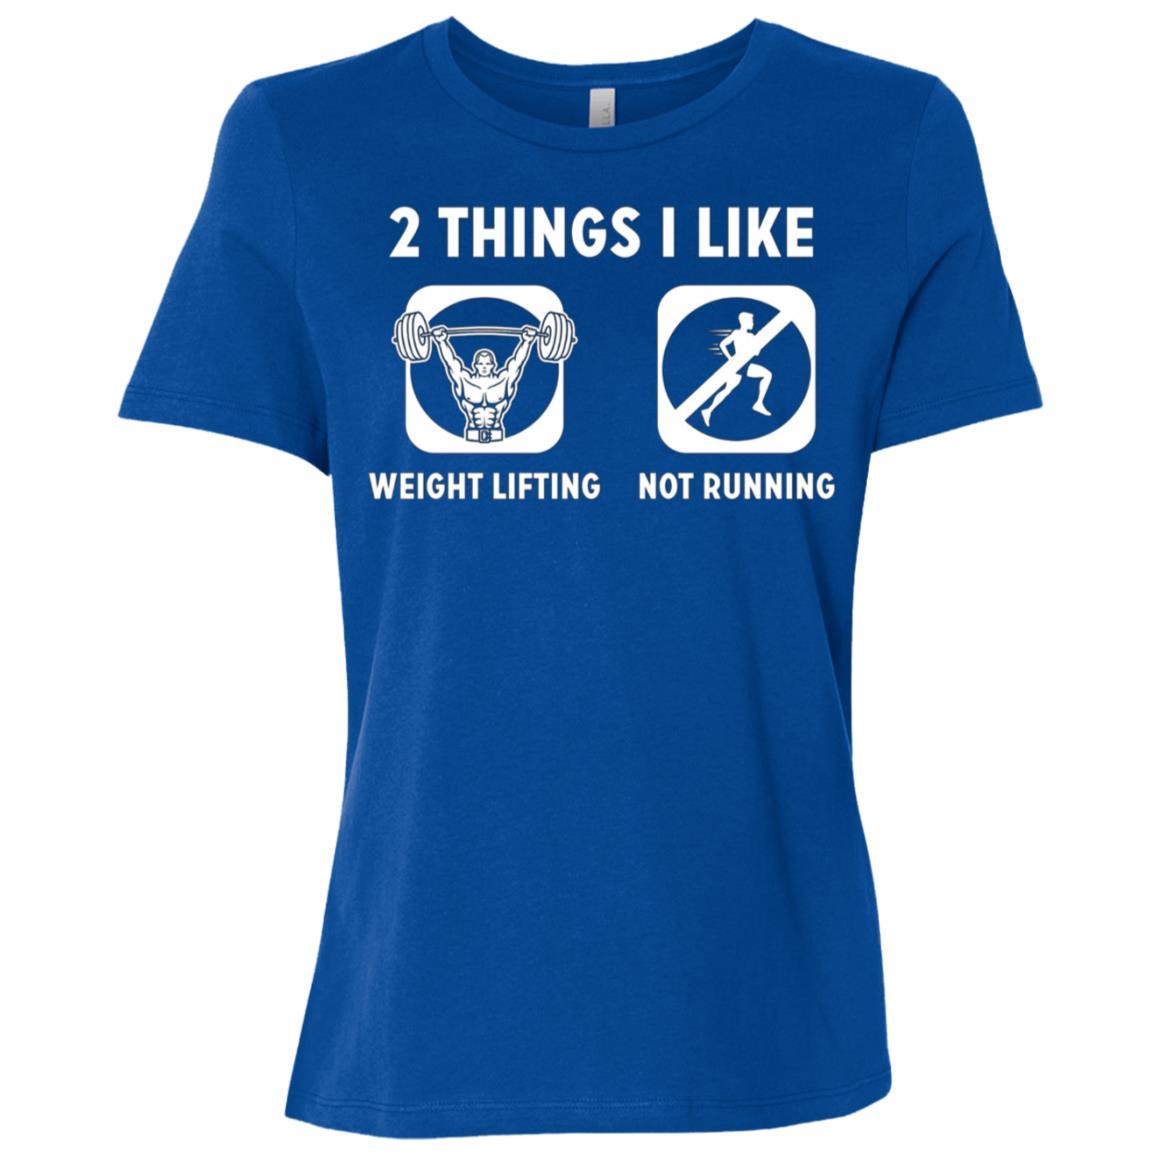 2 Things I Like Weight Lifting Not Running Women Short Sleeve T-Shirt